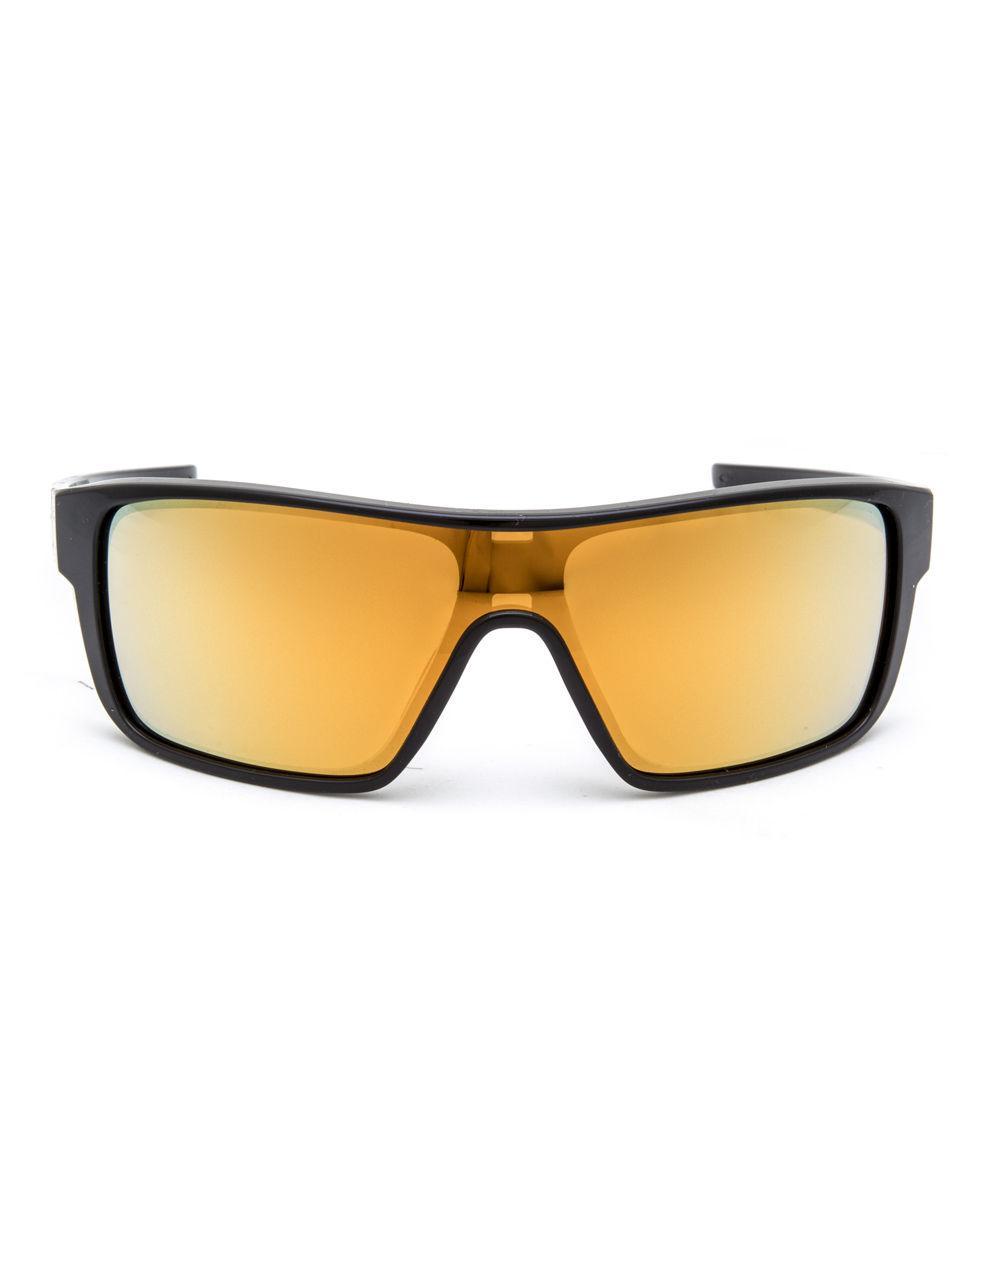 bfdac306ec89e Sunglasses Oakley Polished Lyst Black 24k Straightback Iridium amp   xH0dRWw4v1